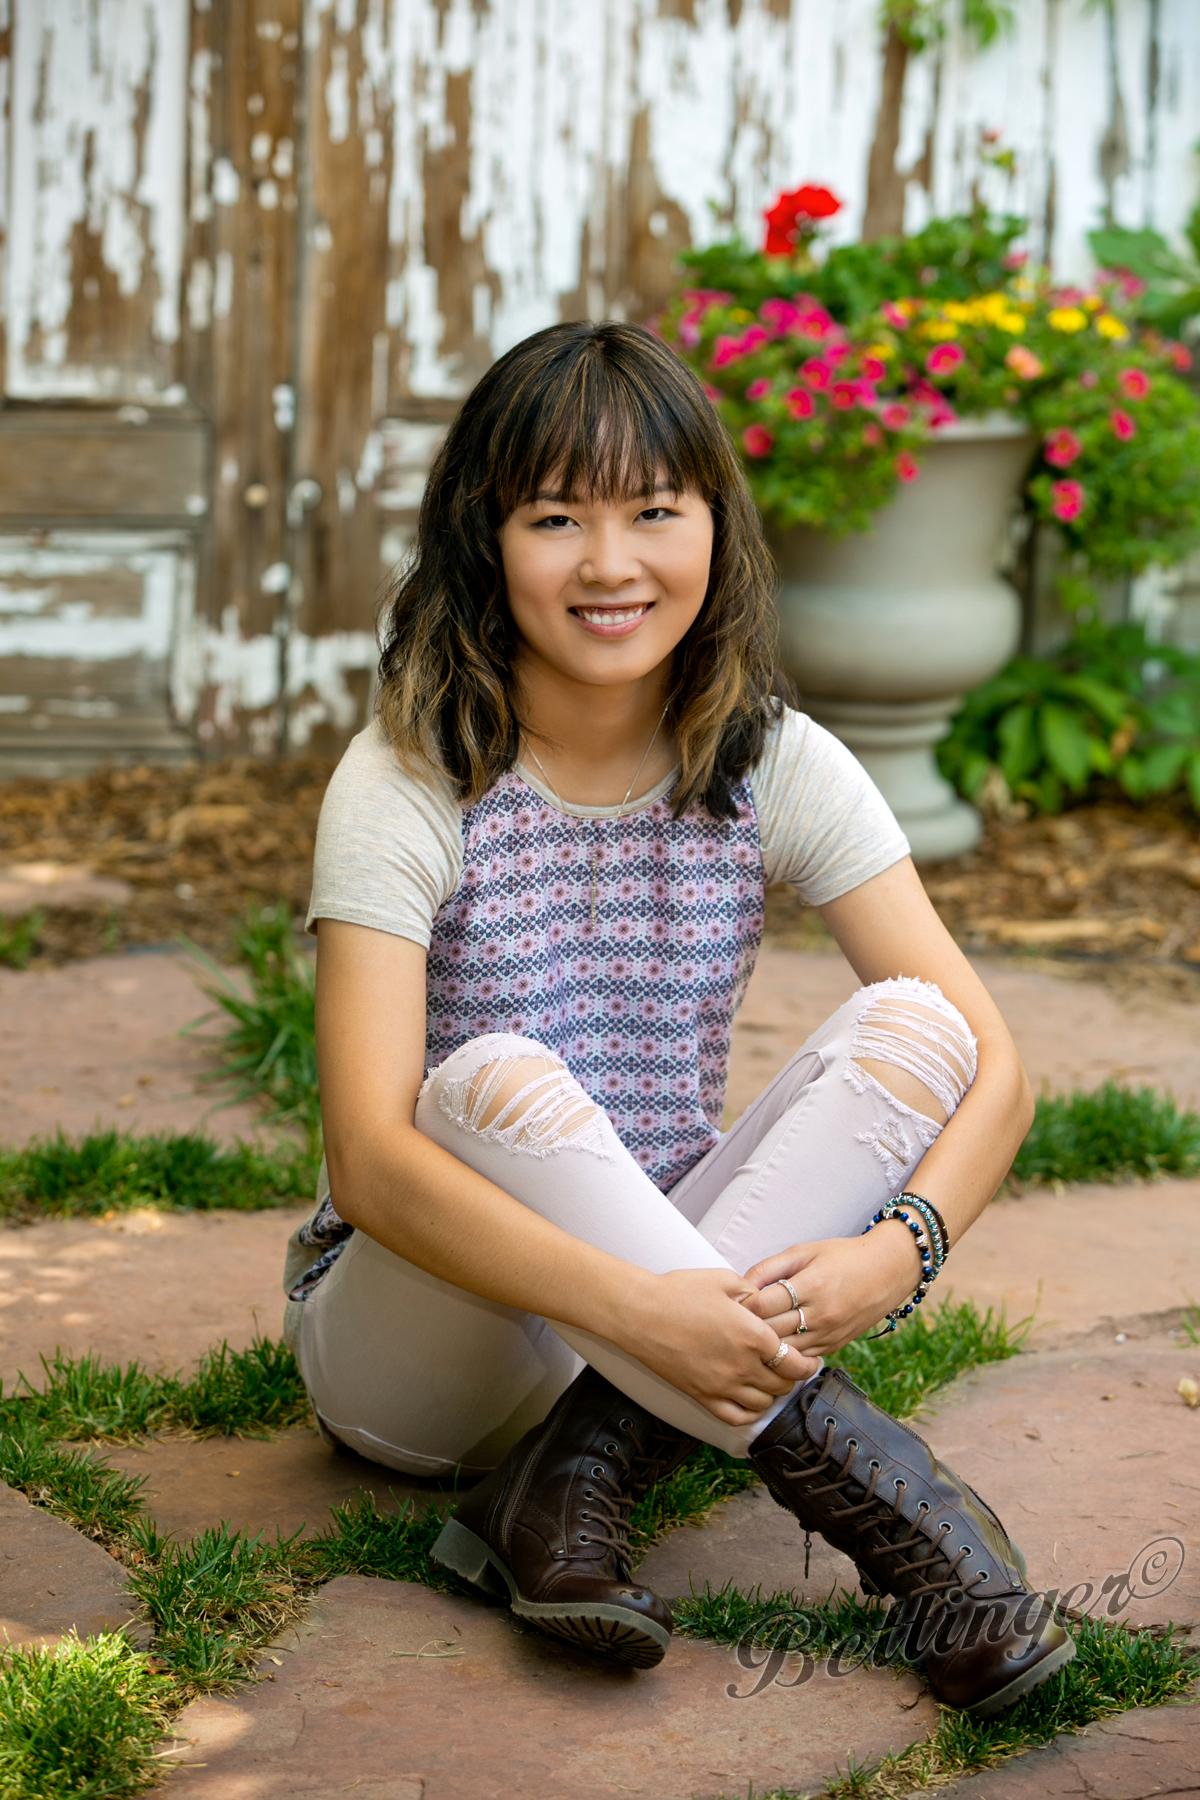 - Megan will be graduating from Grandview High School.